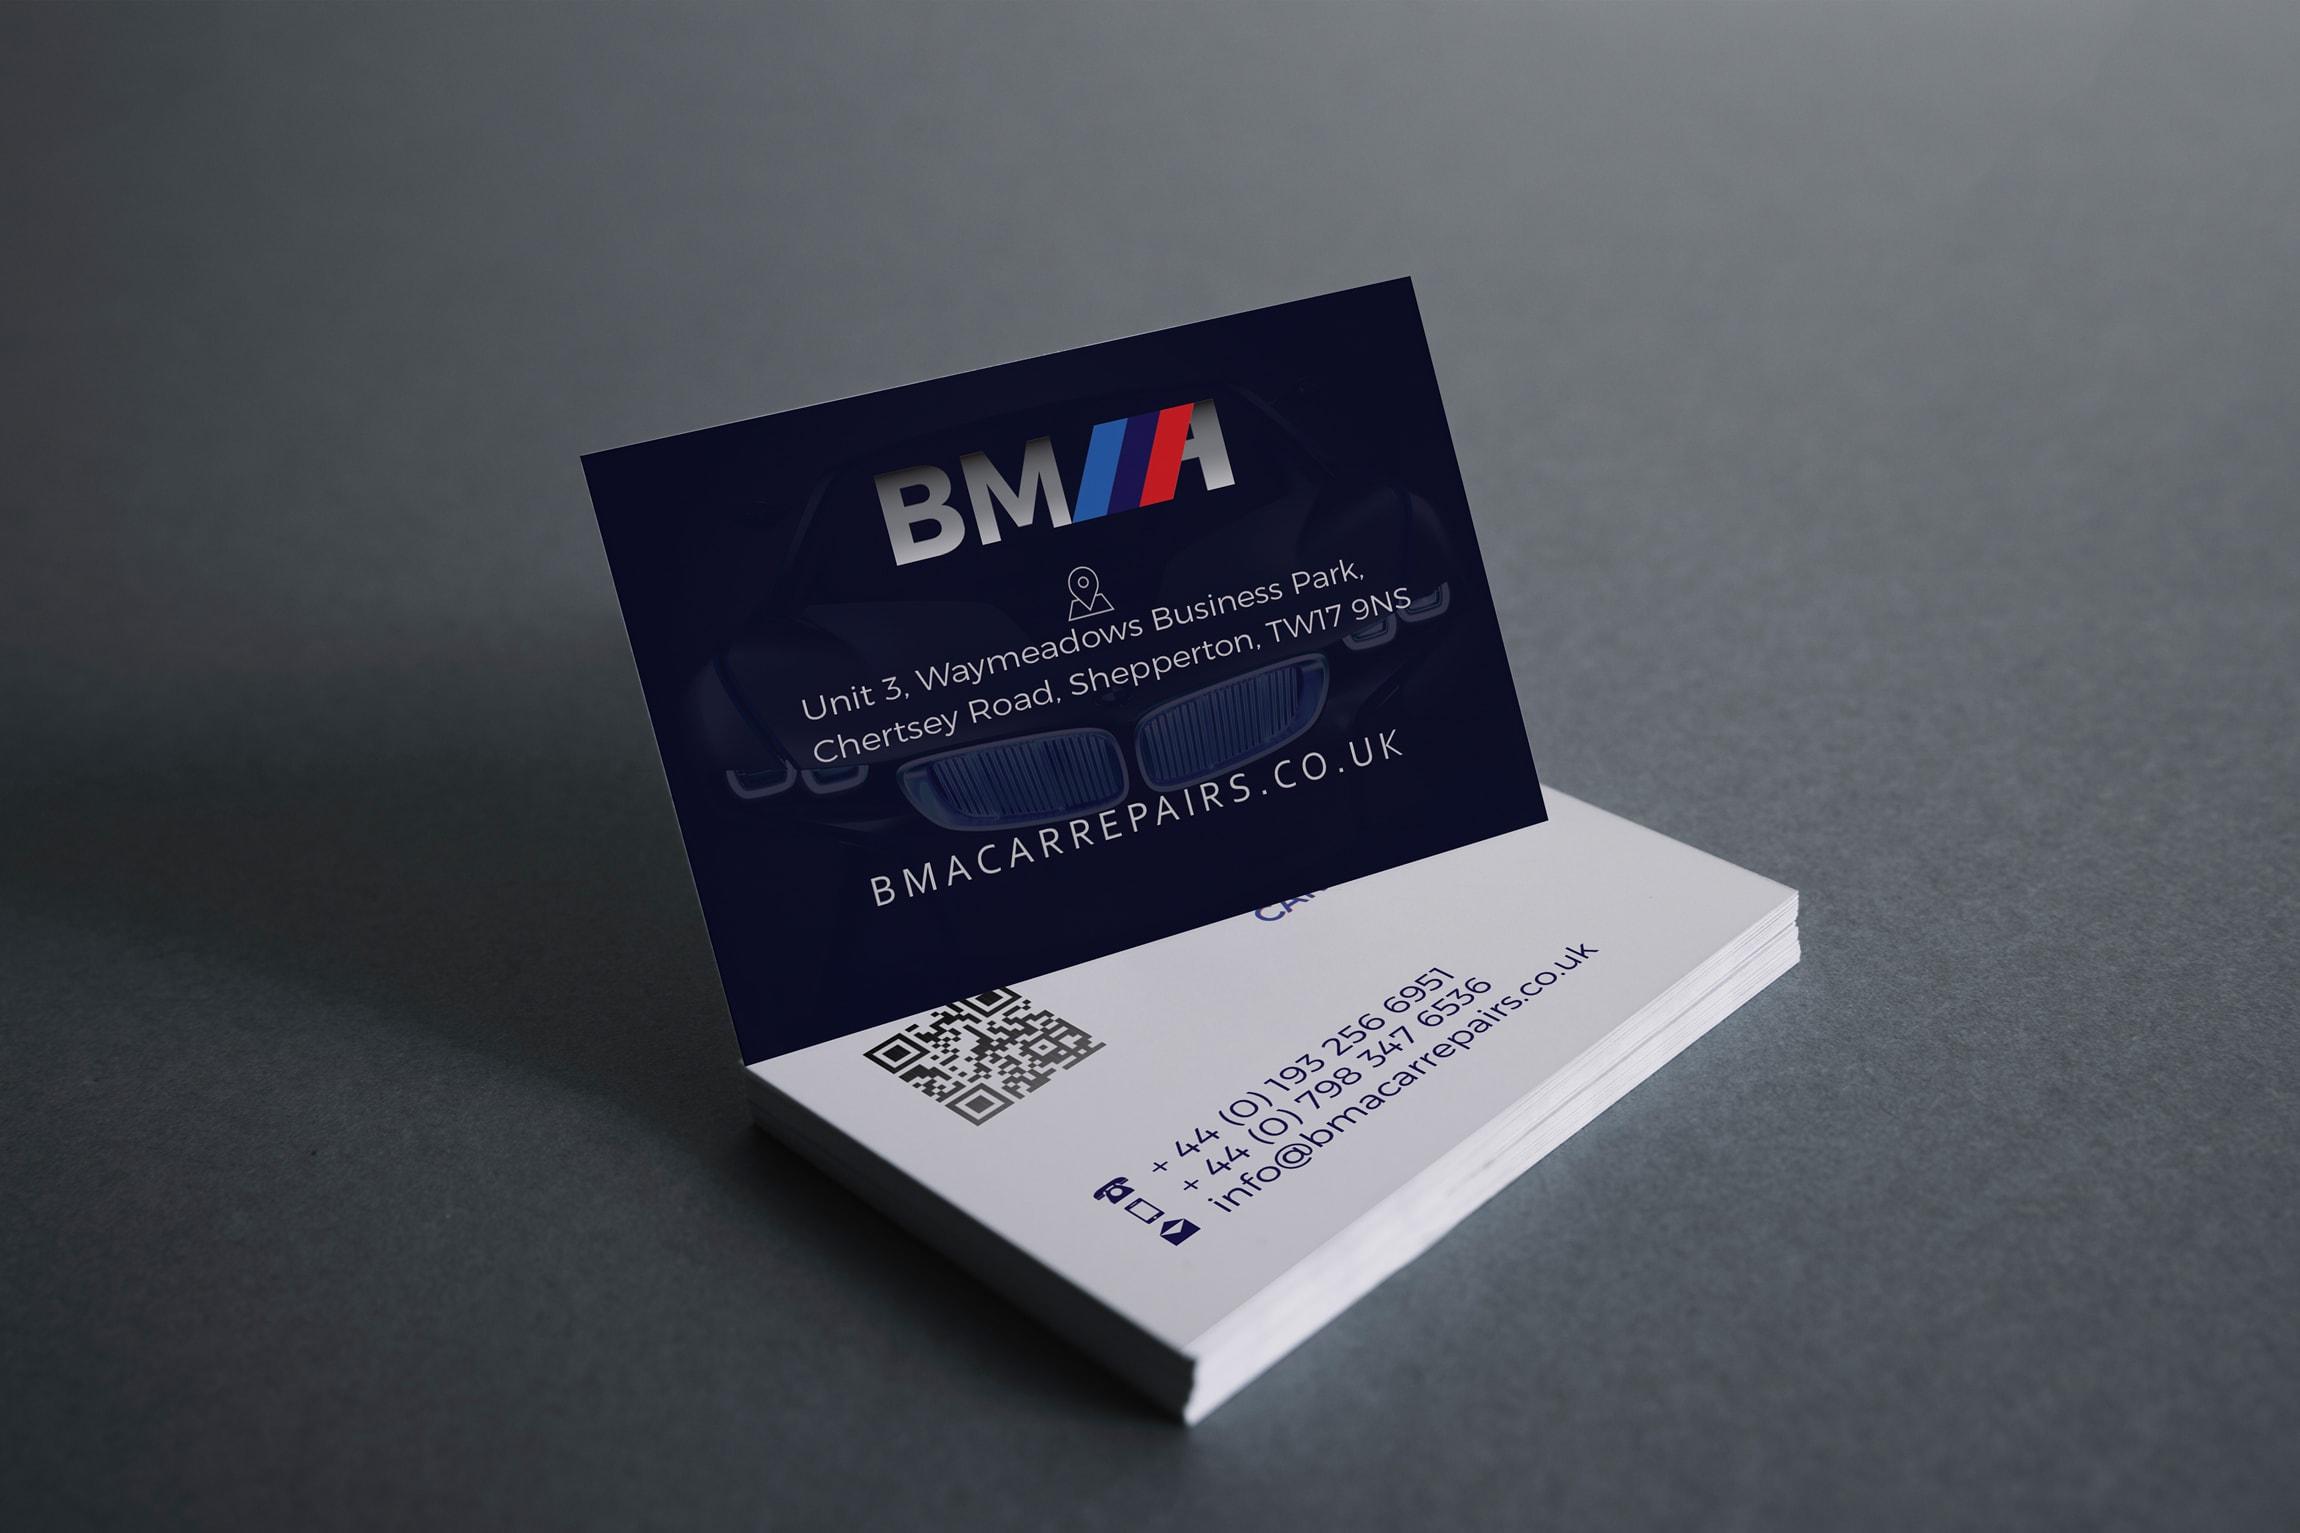 Garage-Business-Card-Design-BMA1-min